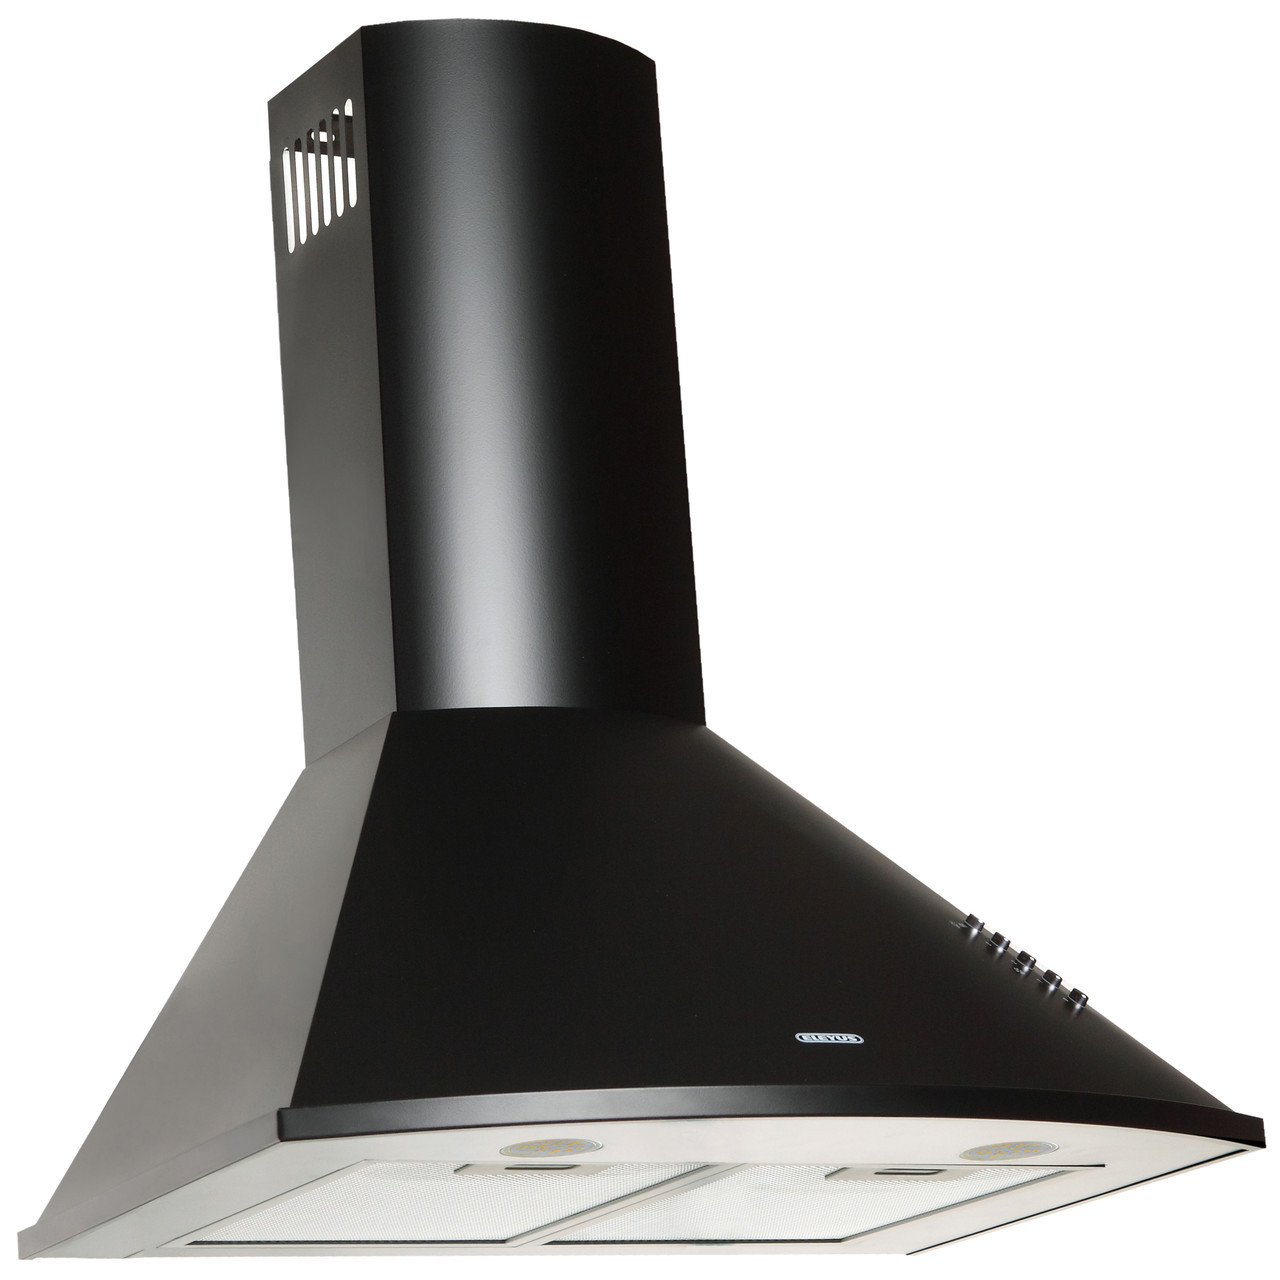 Витяжка кухонна купольна ELEYUS Bora 1200 LED SMD 60 BL + Безкоштовна доставка!